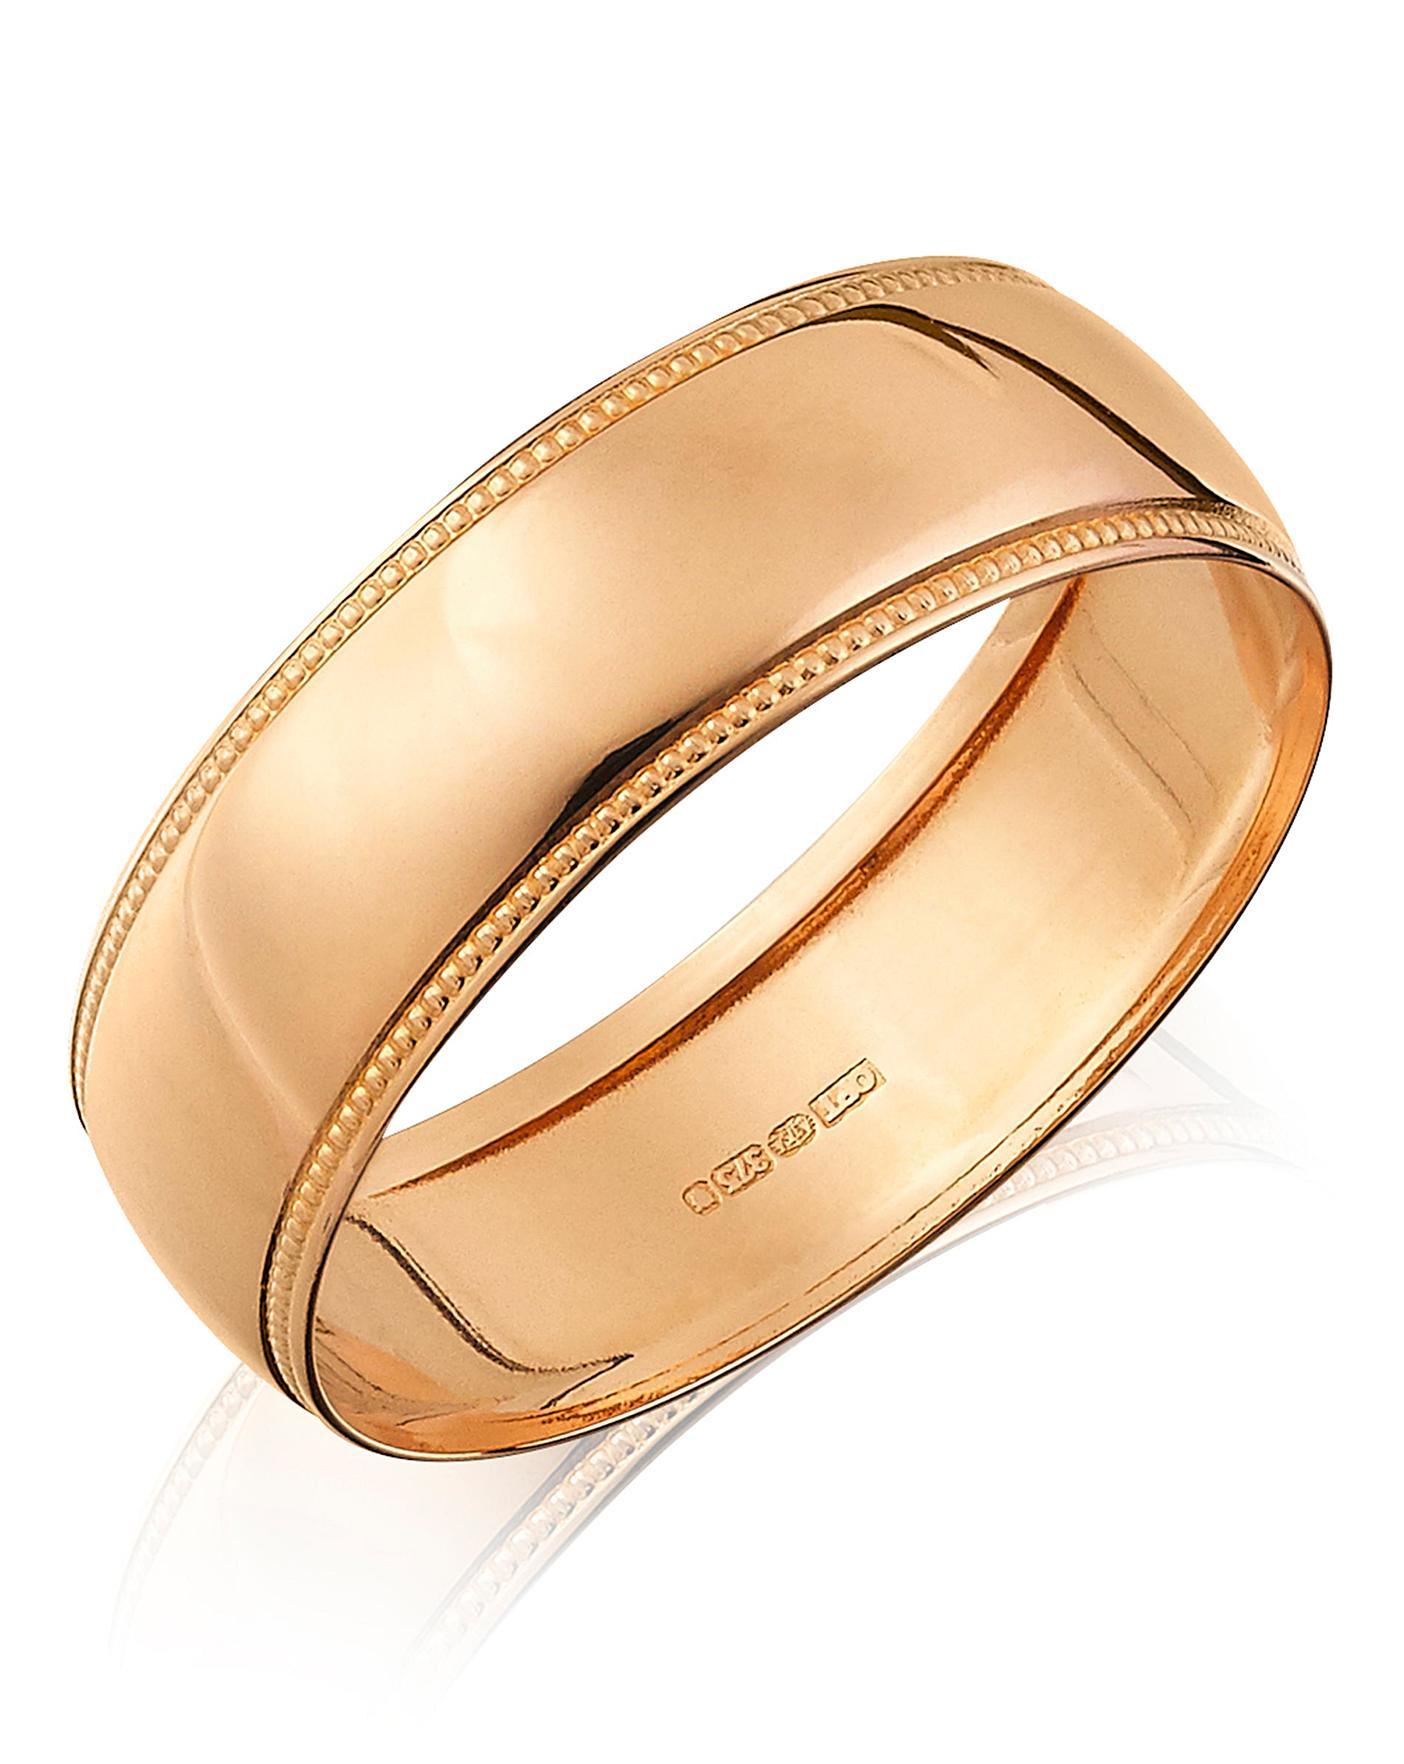 Rose Gold Wedding Band.Gents 9ct Rose Gold Wedding Band